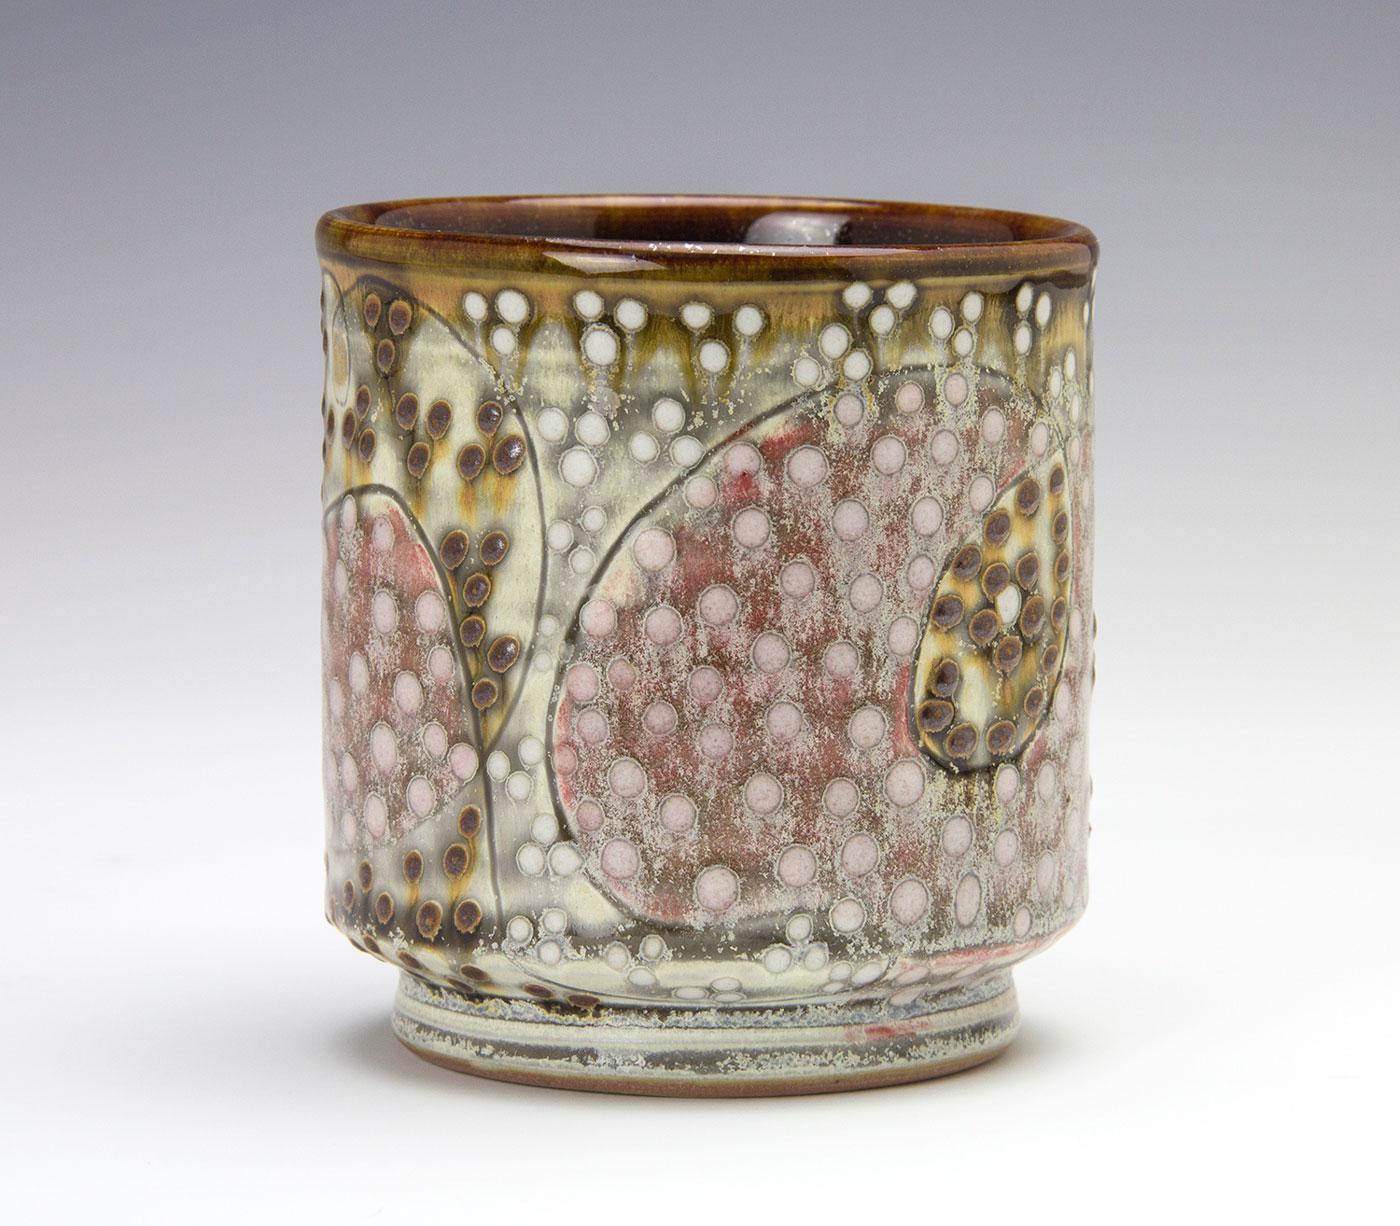 Pattern-Medley-studio-pottery-art-cup-Samantha-Henneke-Seagrove-North-Carolina.jpg